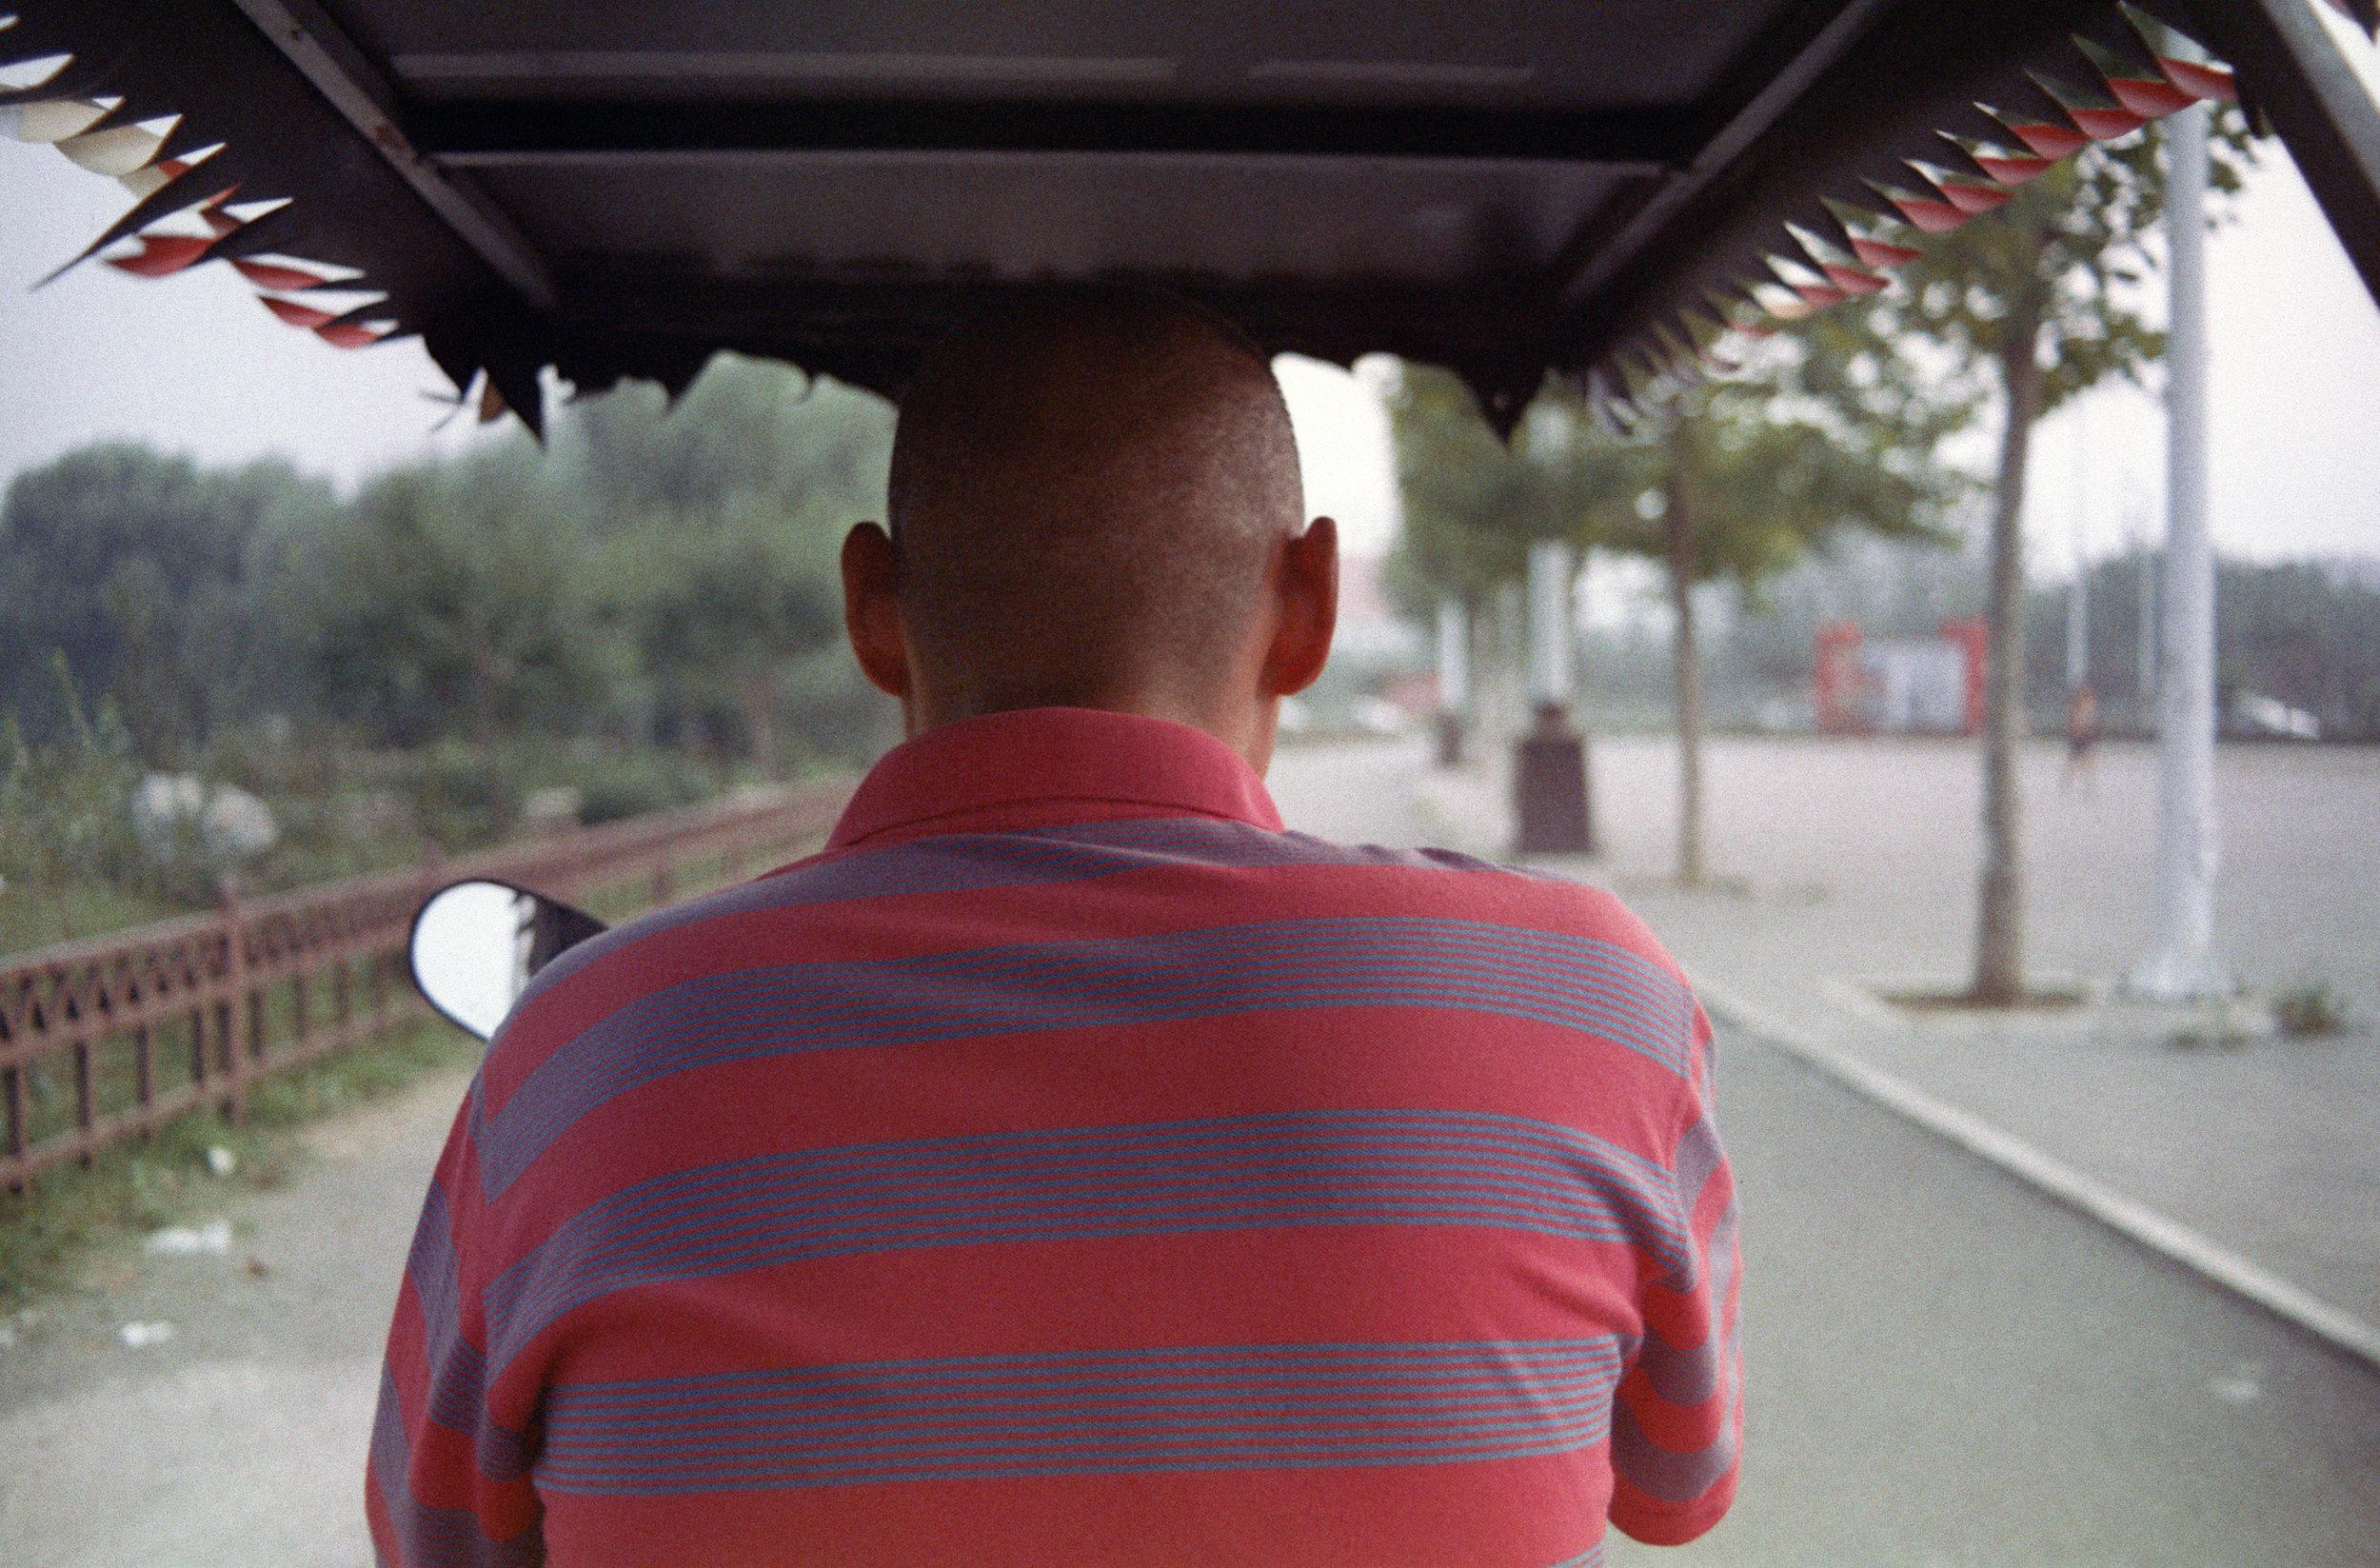 trusting the man on a three-wheel vehicle, beijing, 2015.